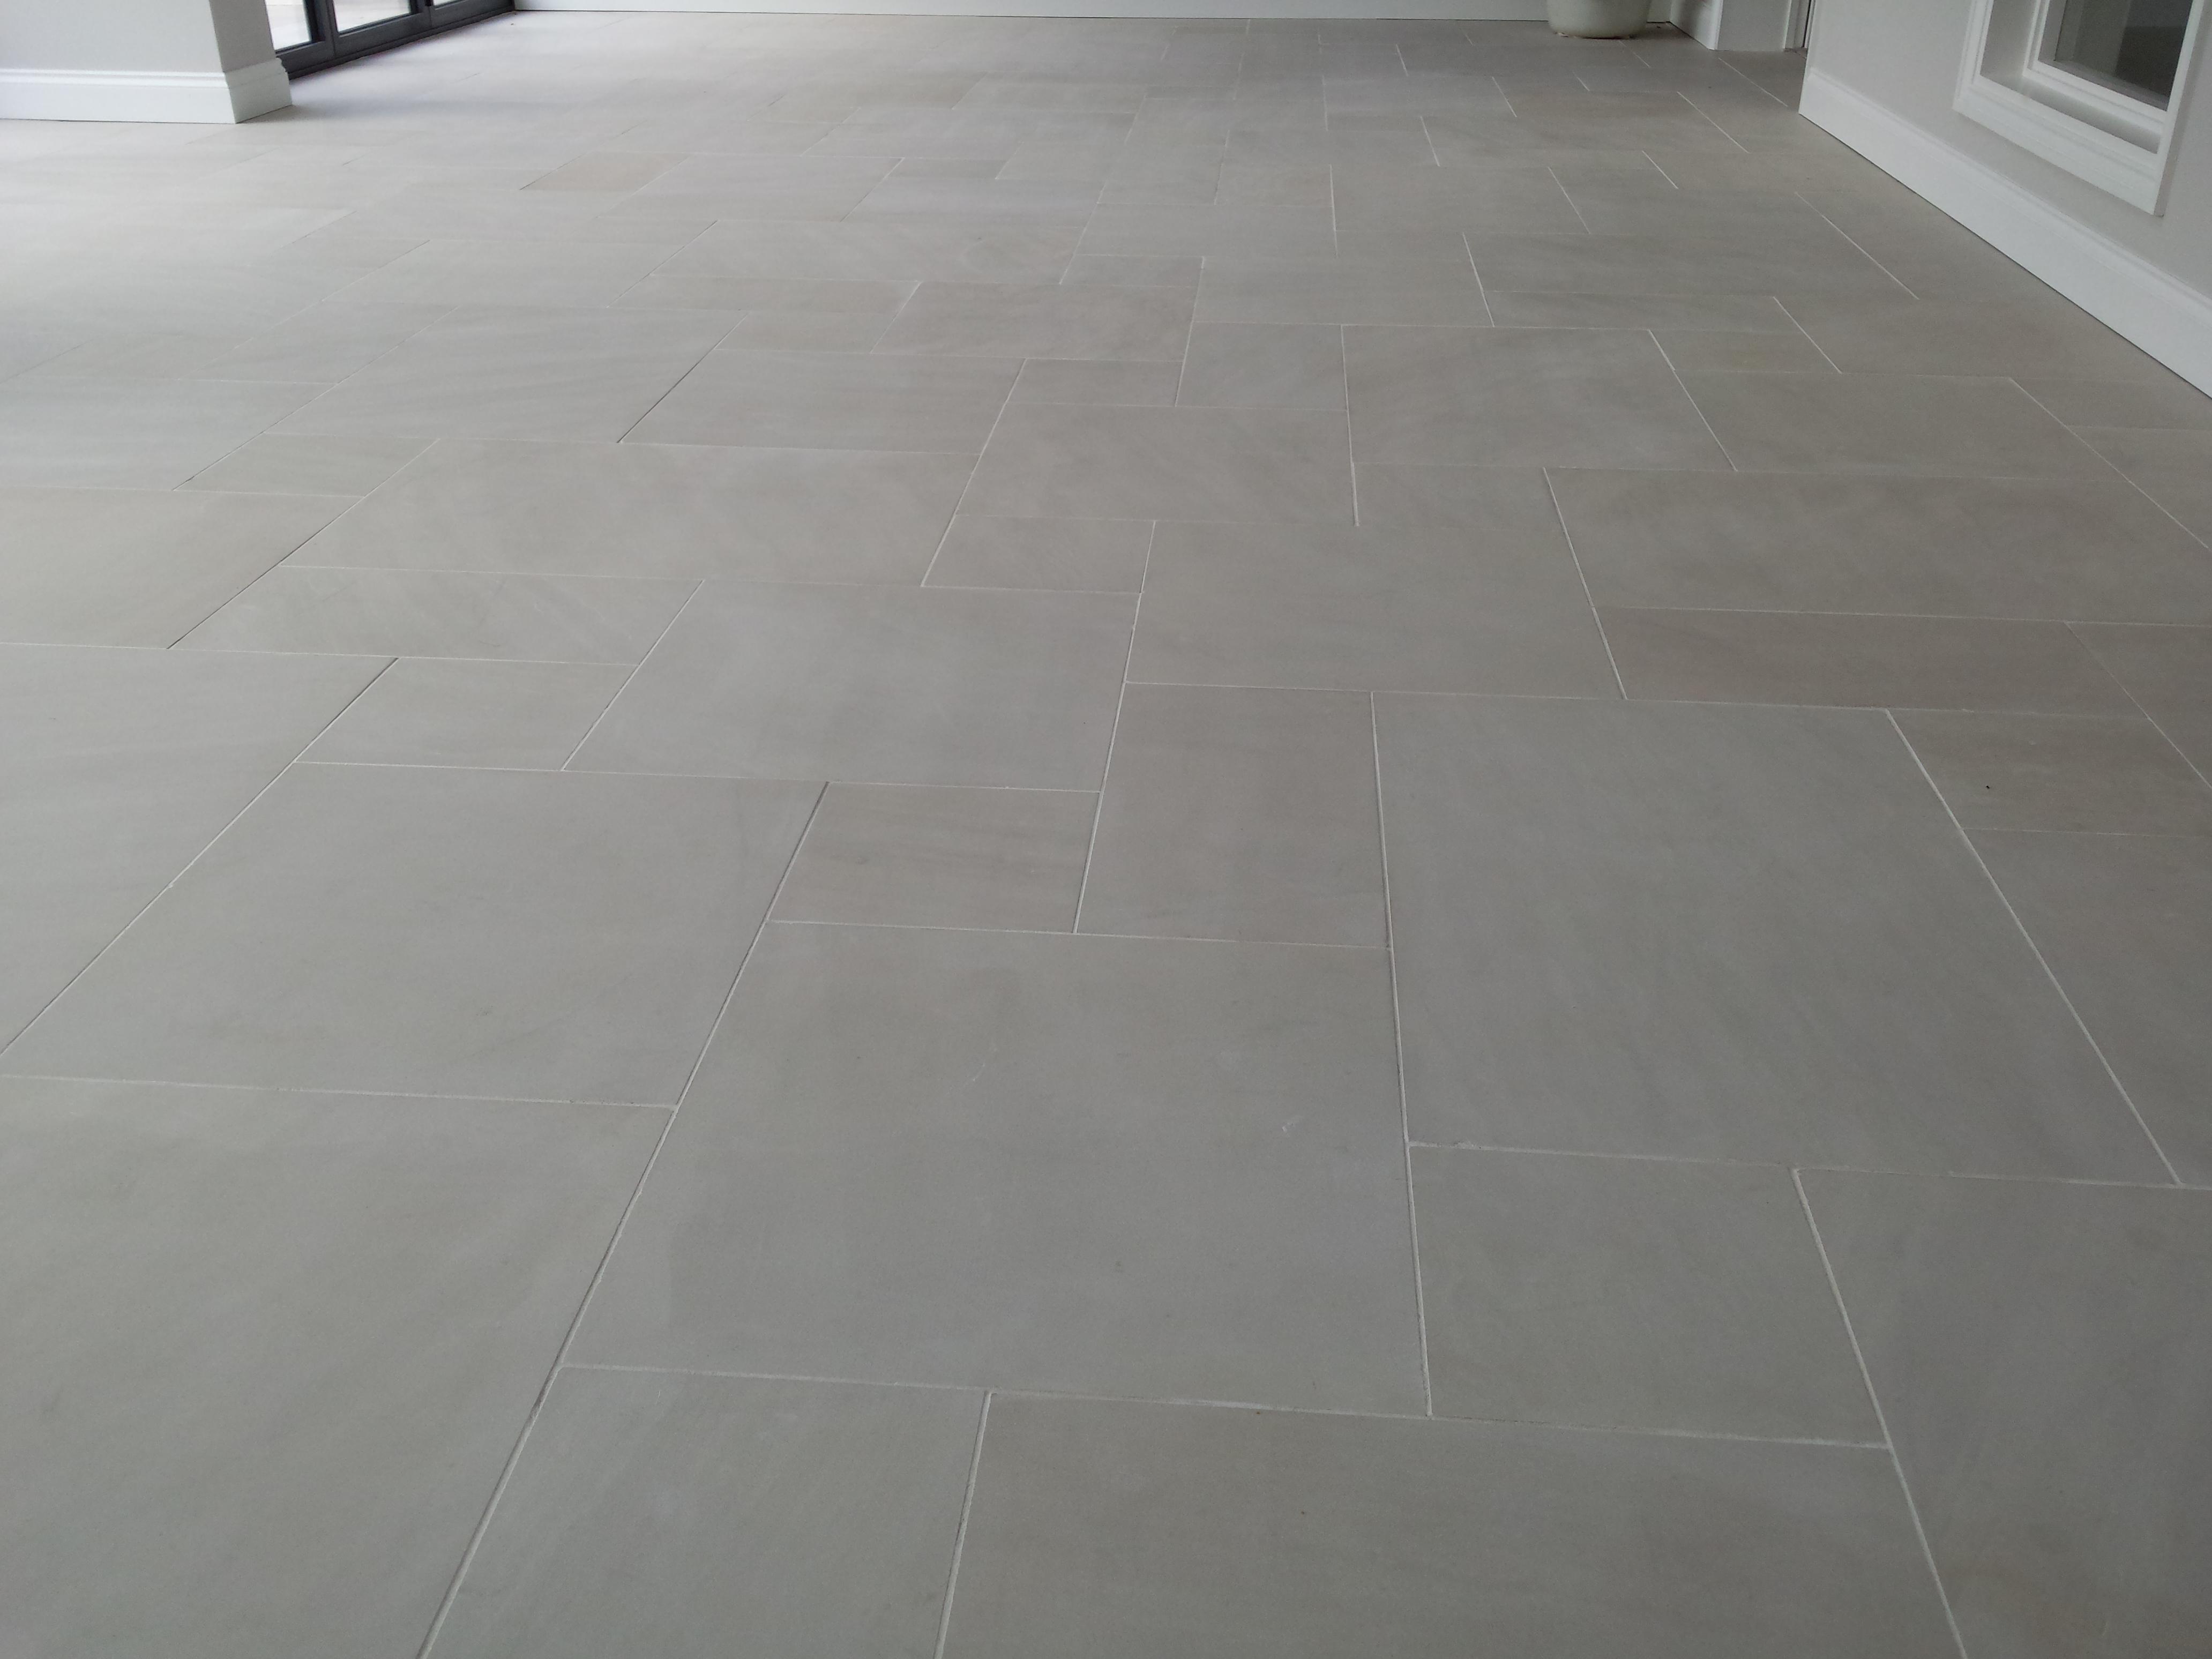 sandstone cleaning u0026 sealing oxfordshire u2013 floor restore oxford ltd